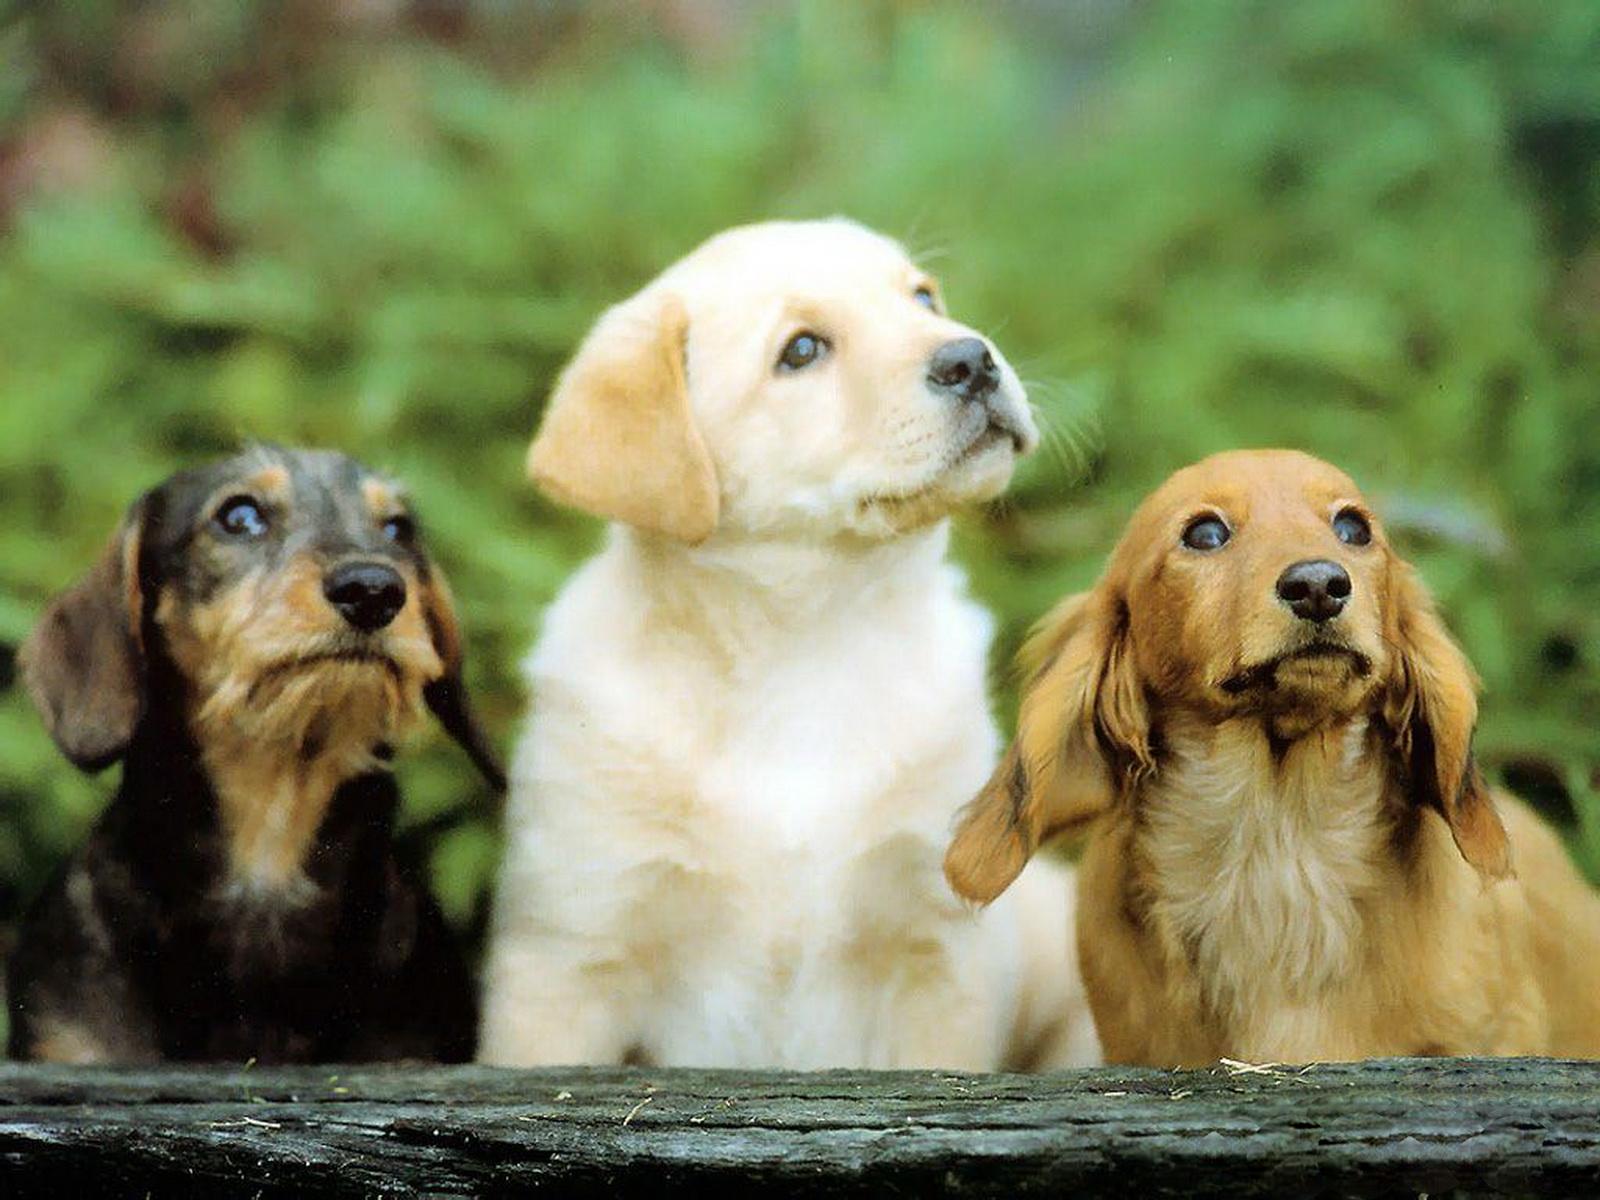 http://3.bp.blogspot.com/-z7r_9CHjrdA/Tyw8CXPuk7I/AAAAAAAAA10/J9mSNHzX0A0/s1600/10-Cute+Dog+1600x1200.jpg